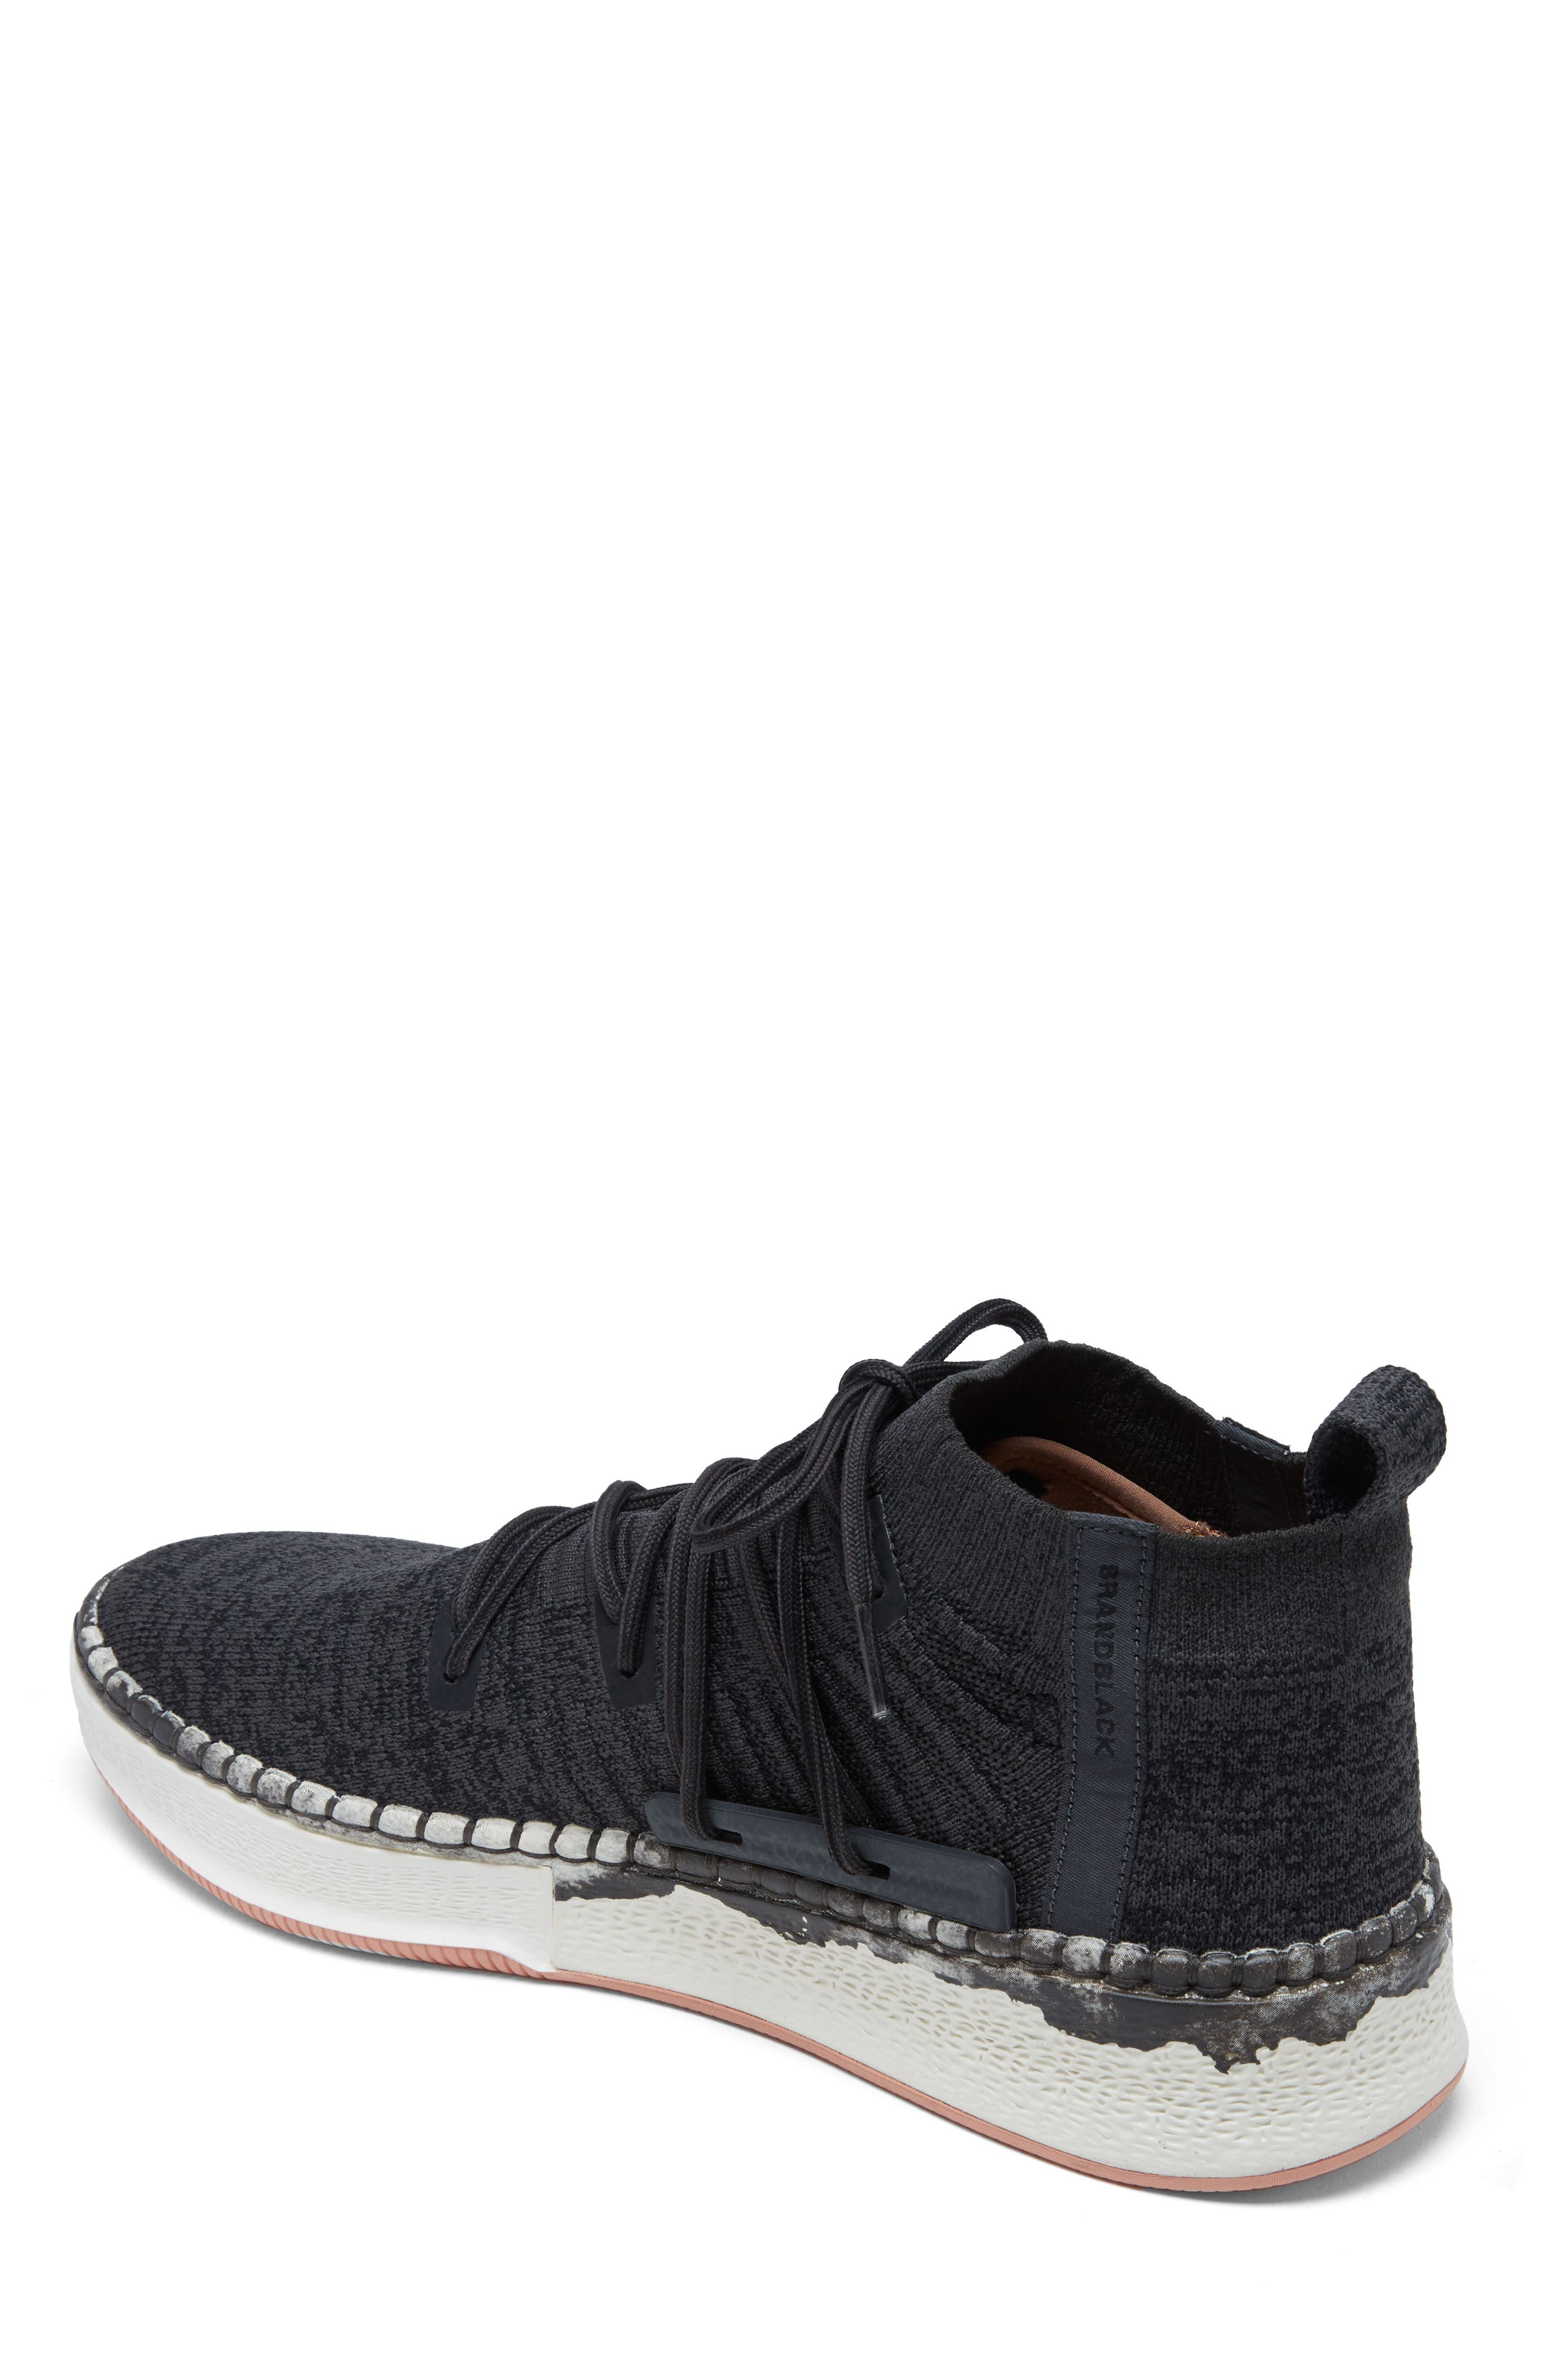 Delta Shibori Sneaker,                             Alternate thumbnail 2, color,                             011